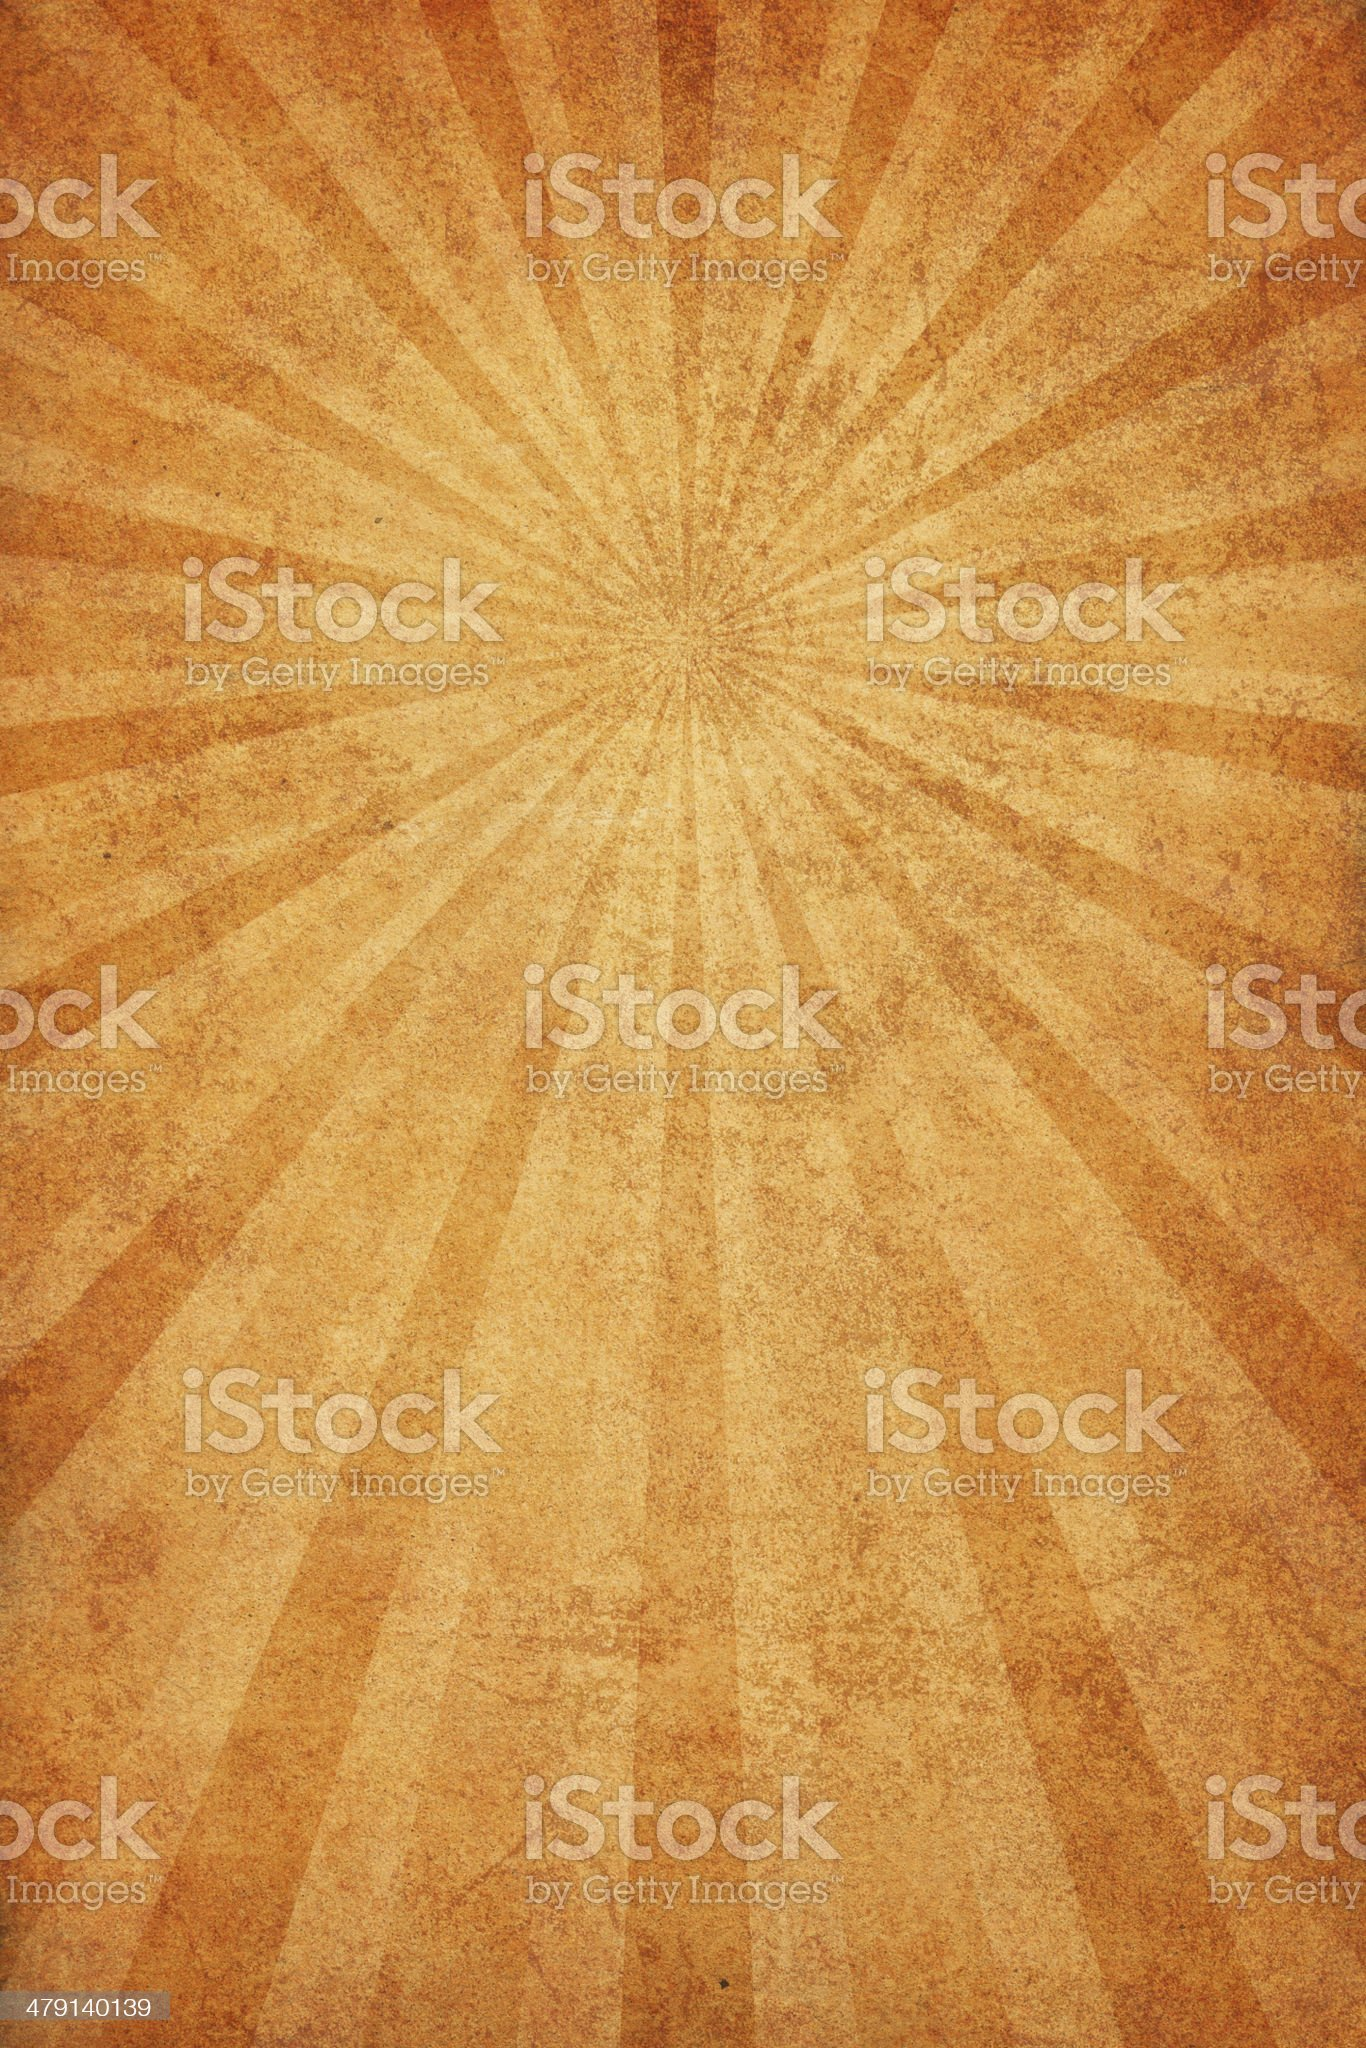 Venetian wall texture with sunbeams royalty-free stock vector art